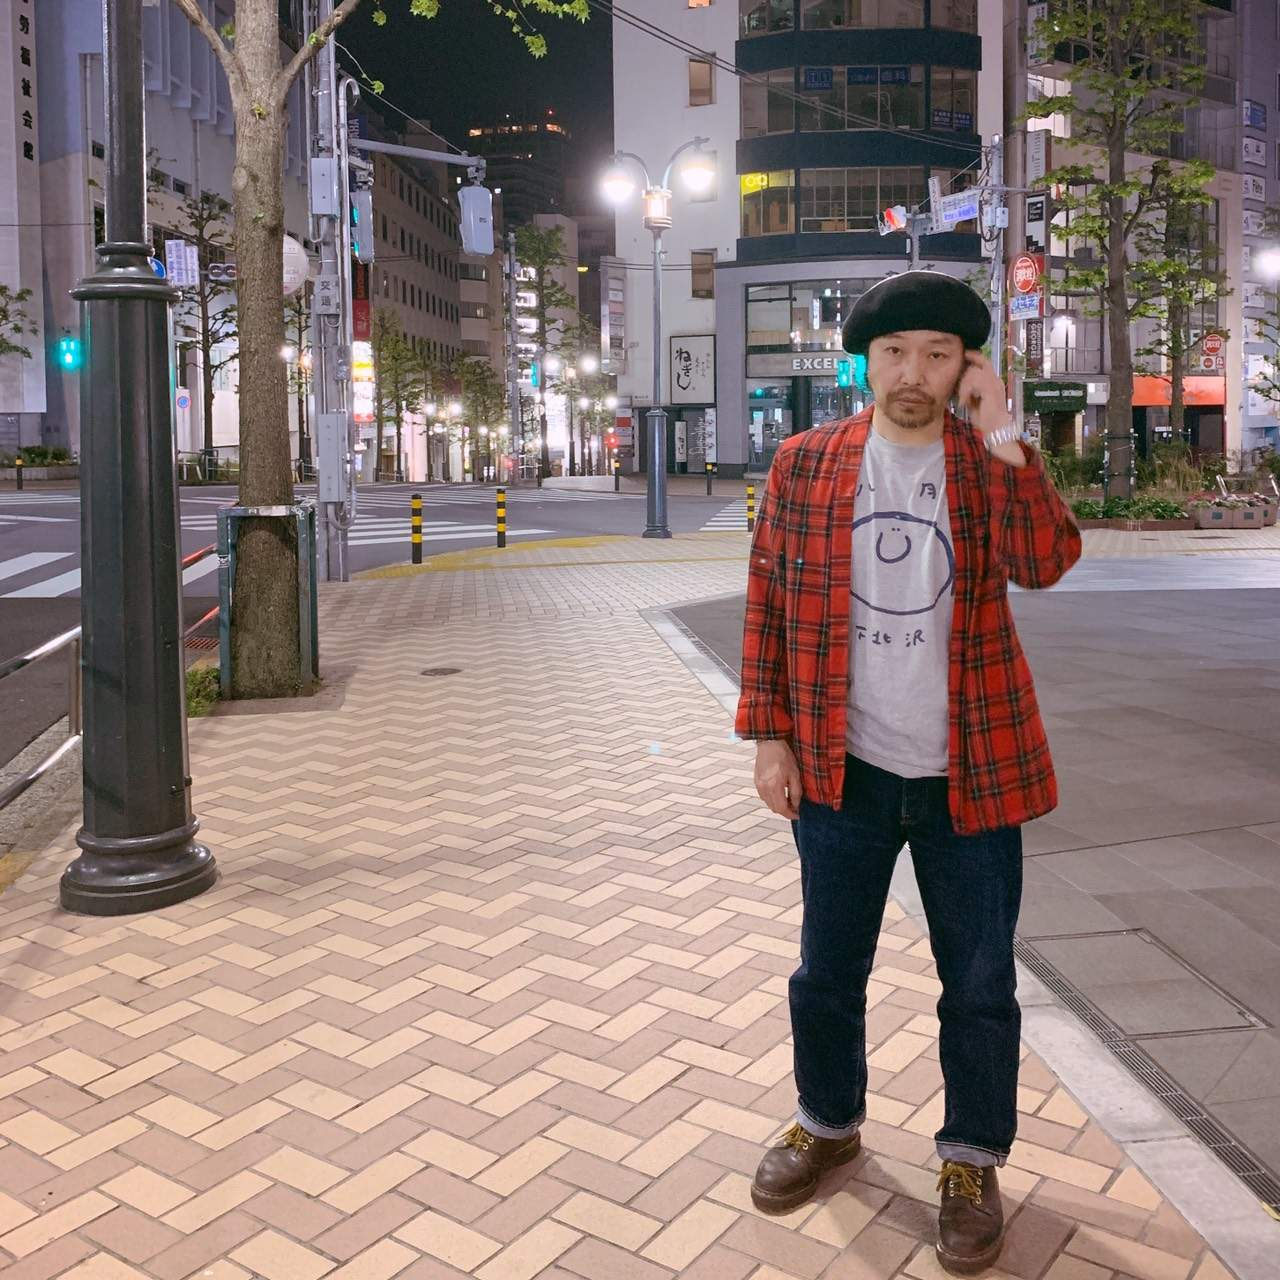 http://rose-records.jp/files/20200506183219.jpg